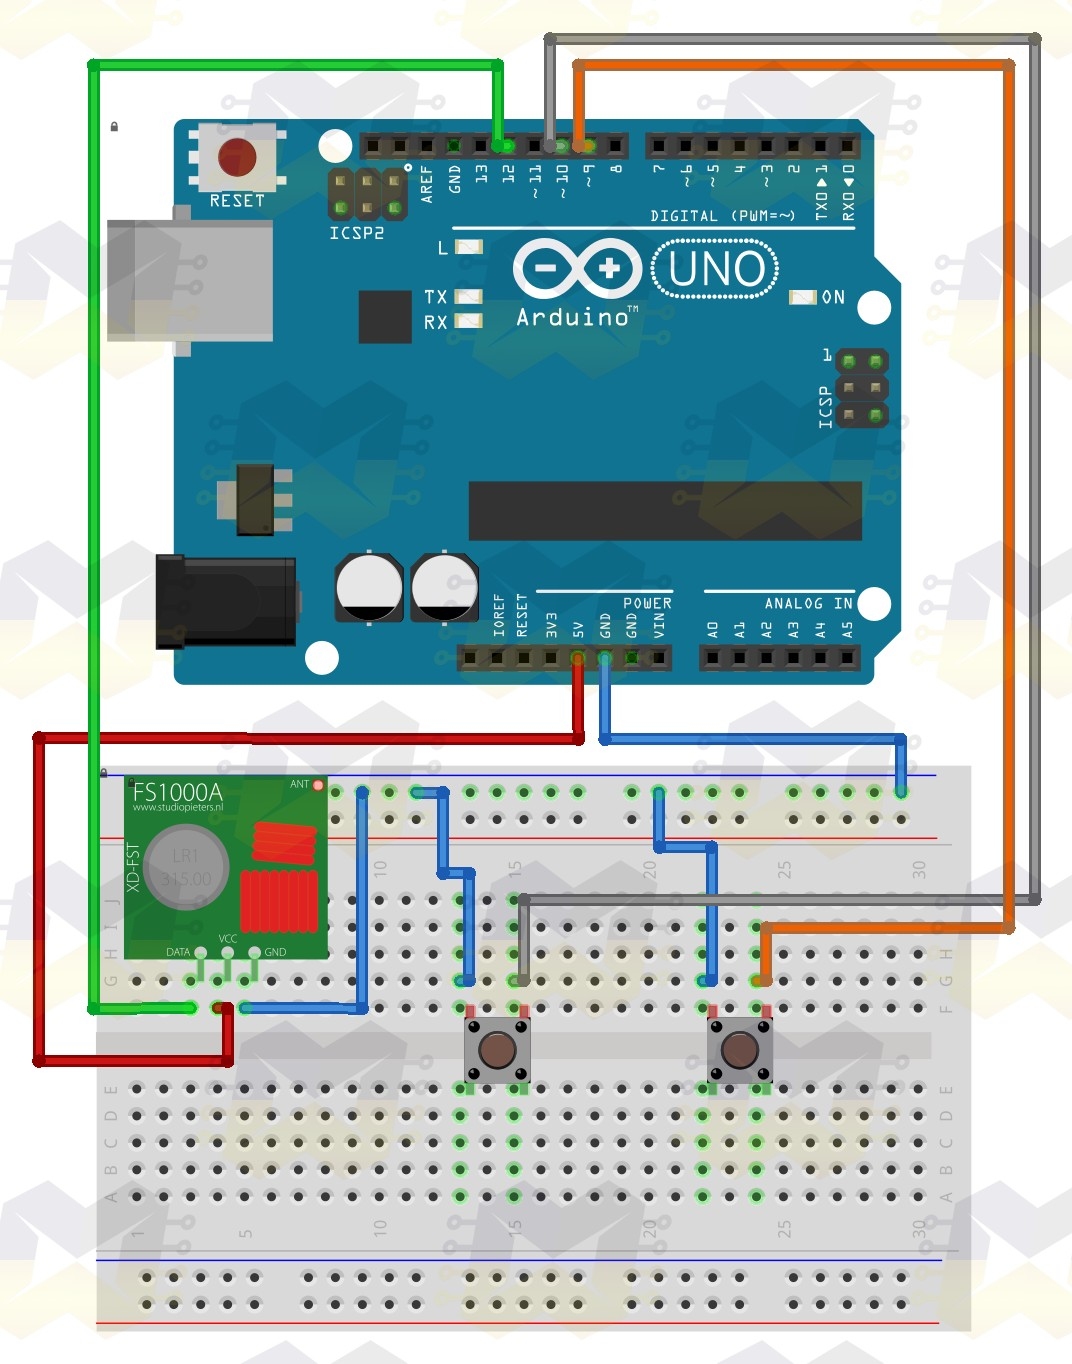 img01_arduino_utilizando_o_interruptor_modulo_rele_com_rf_433mhz_para_automacao_web_smartphone_tablet_controle_remoto_lampada